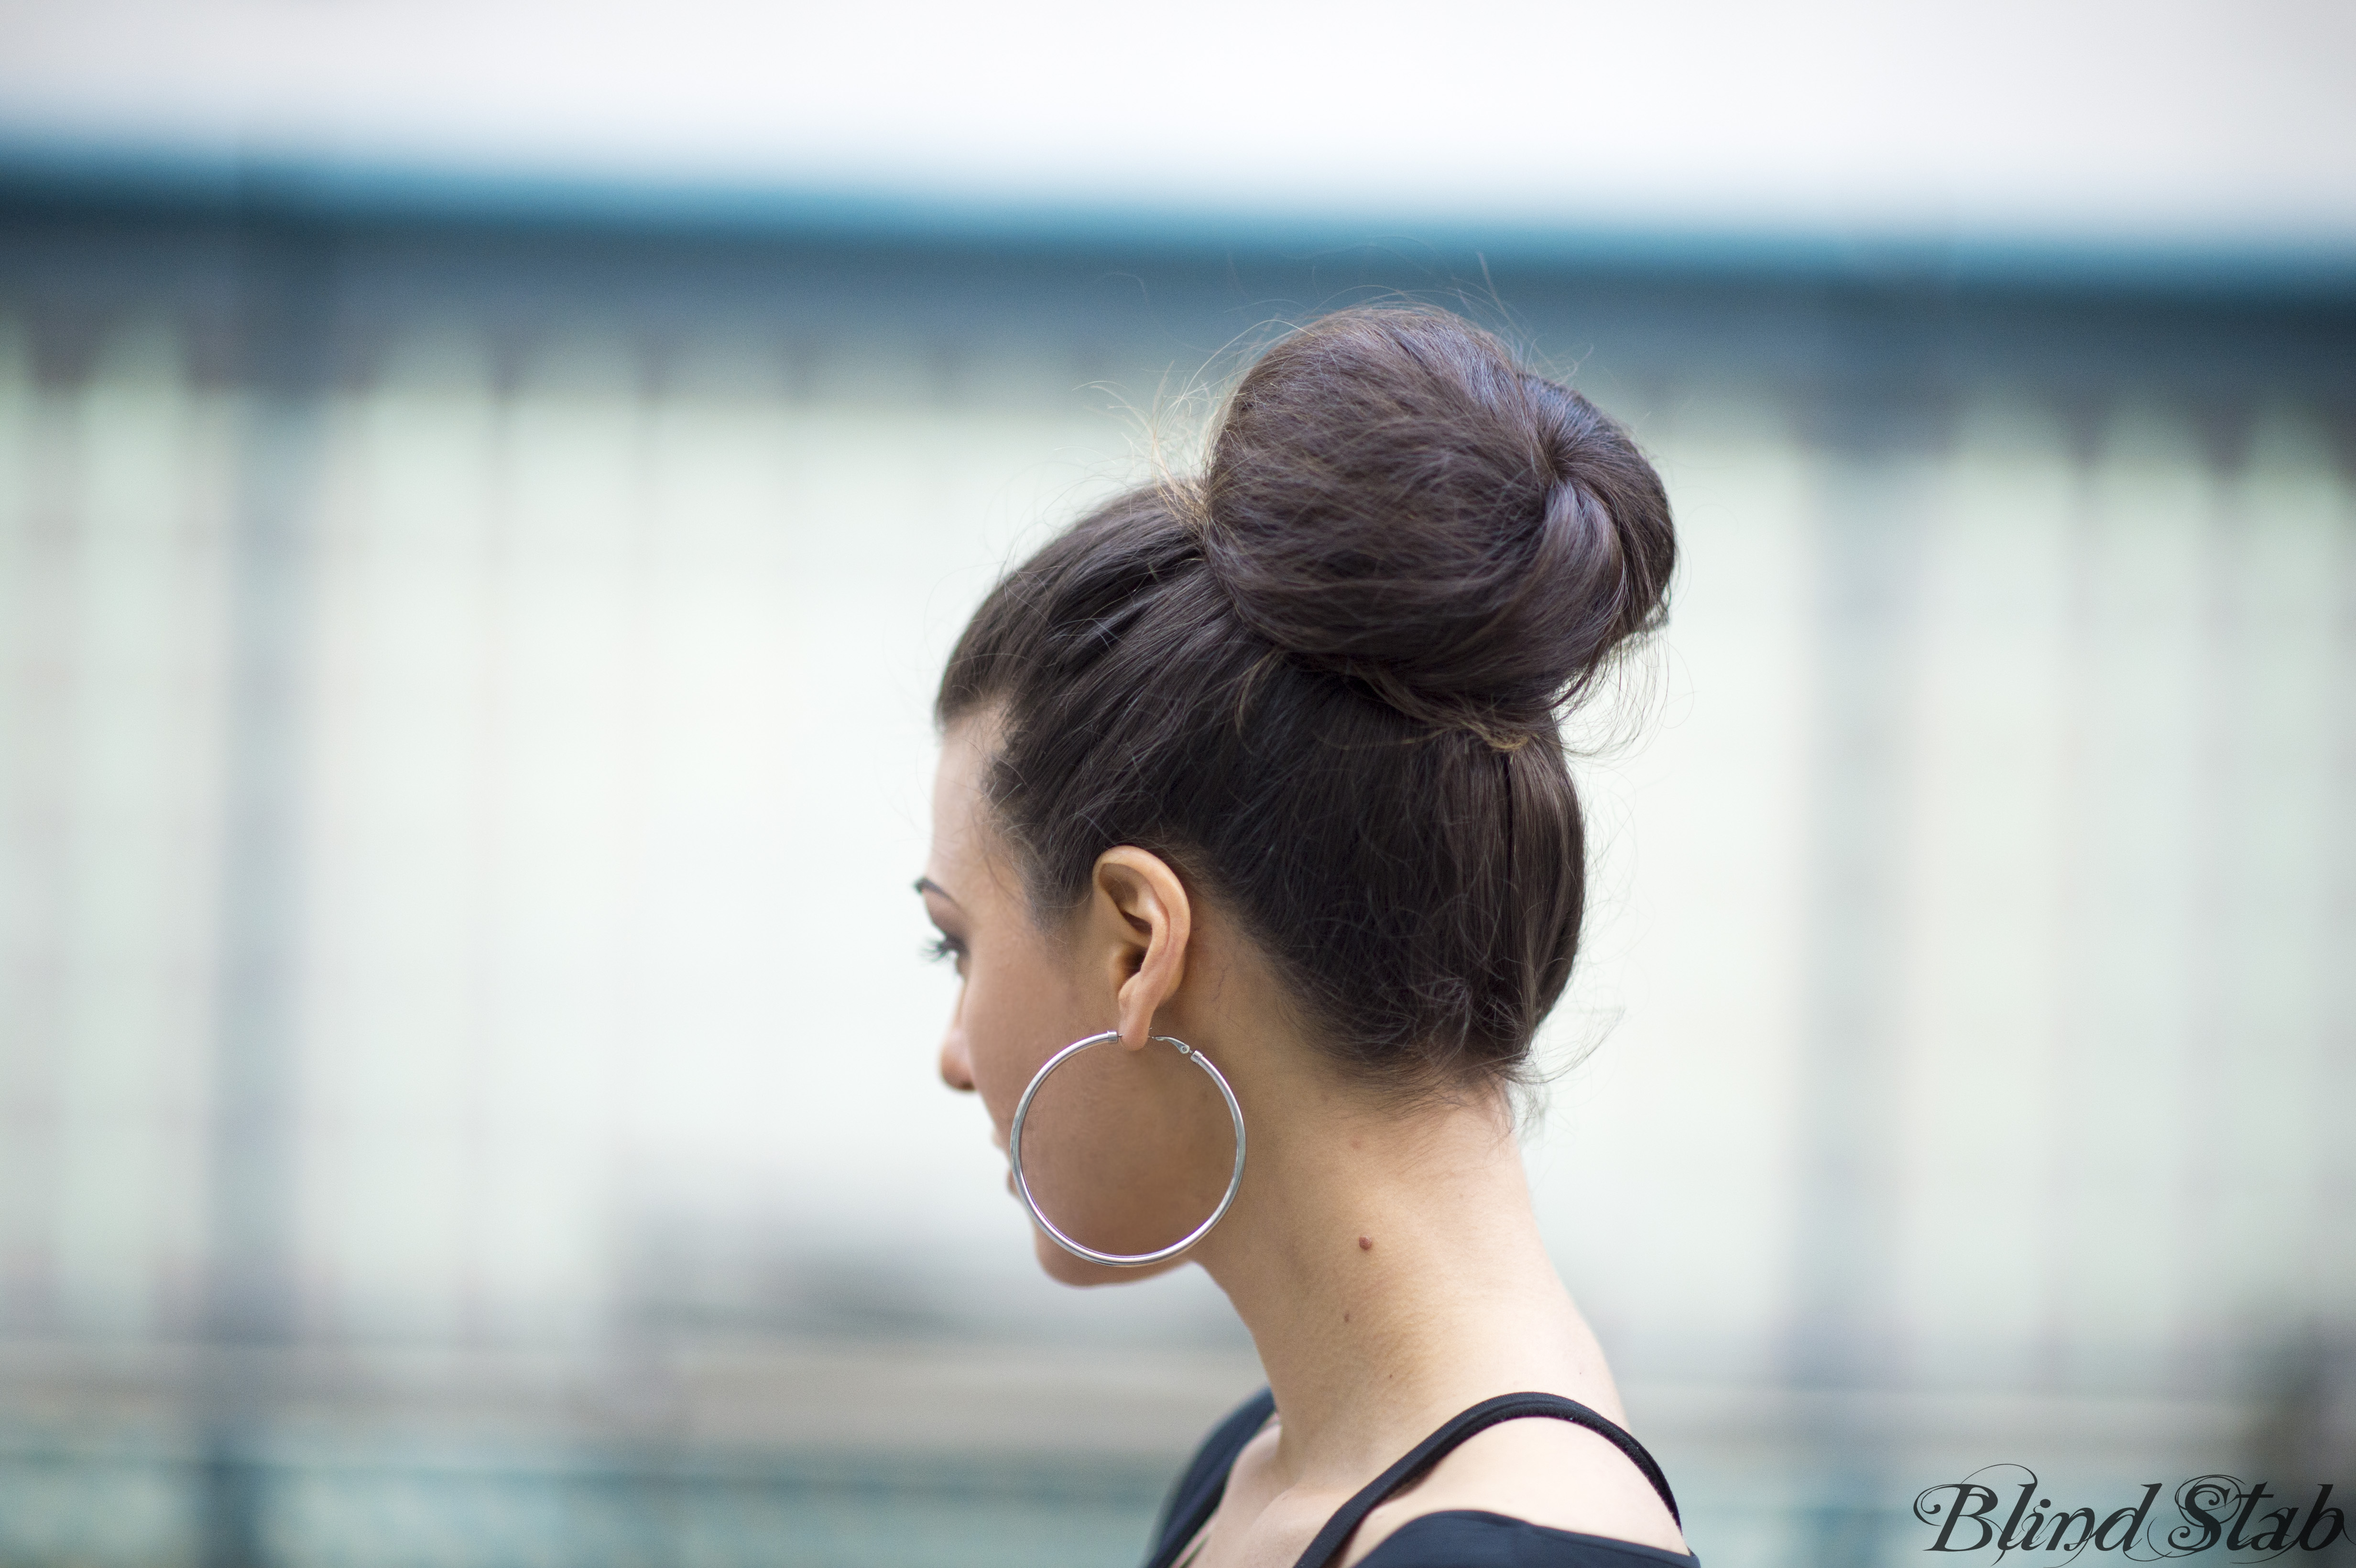 Hair-Updo-Lace-Bellbottoms-Wrist-Tattoo